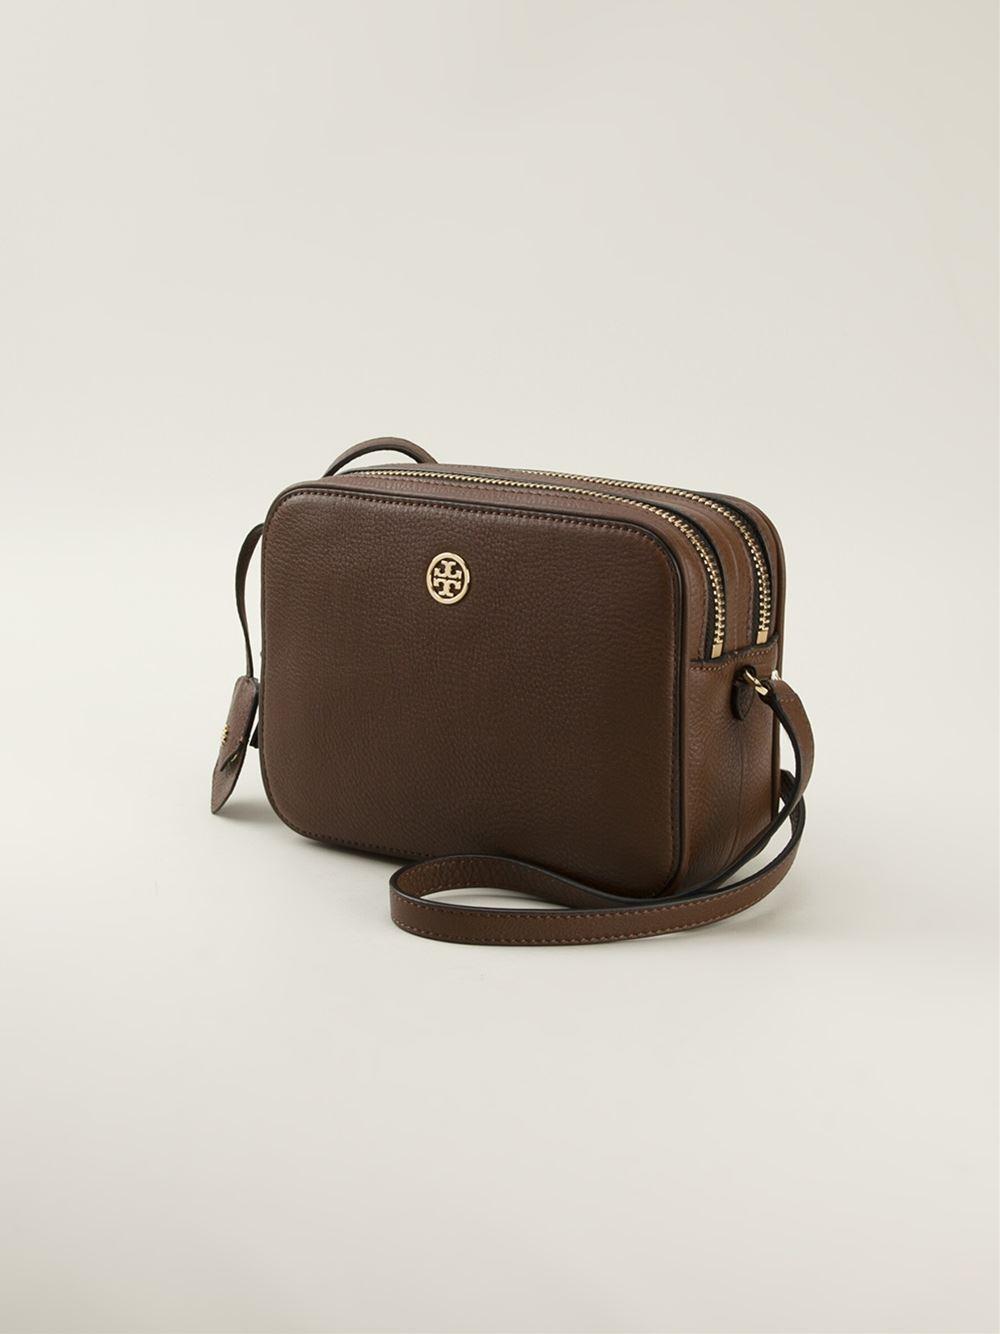 3fef4a1e9cbb Lyst - Tory Burch Robinson Double Zip Crossbody Bag in Brown